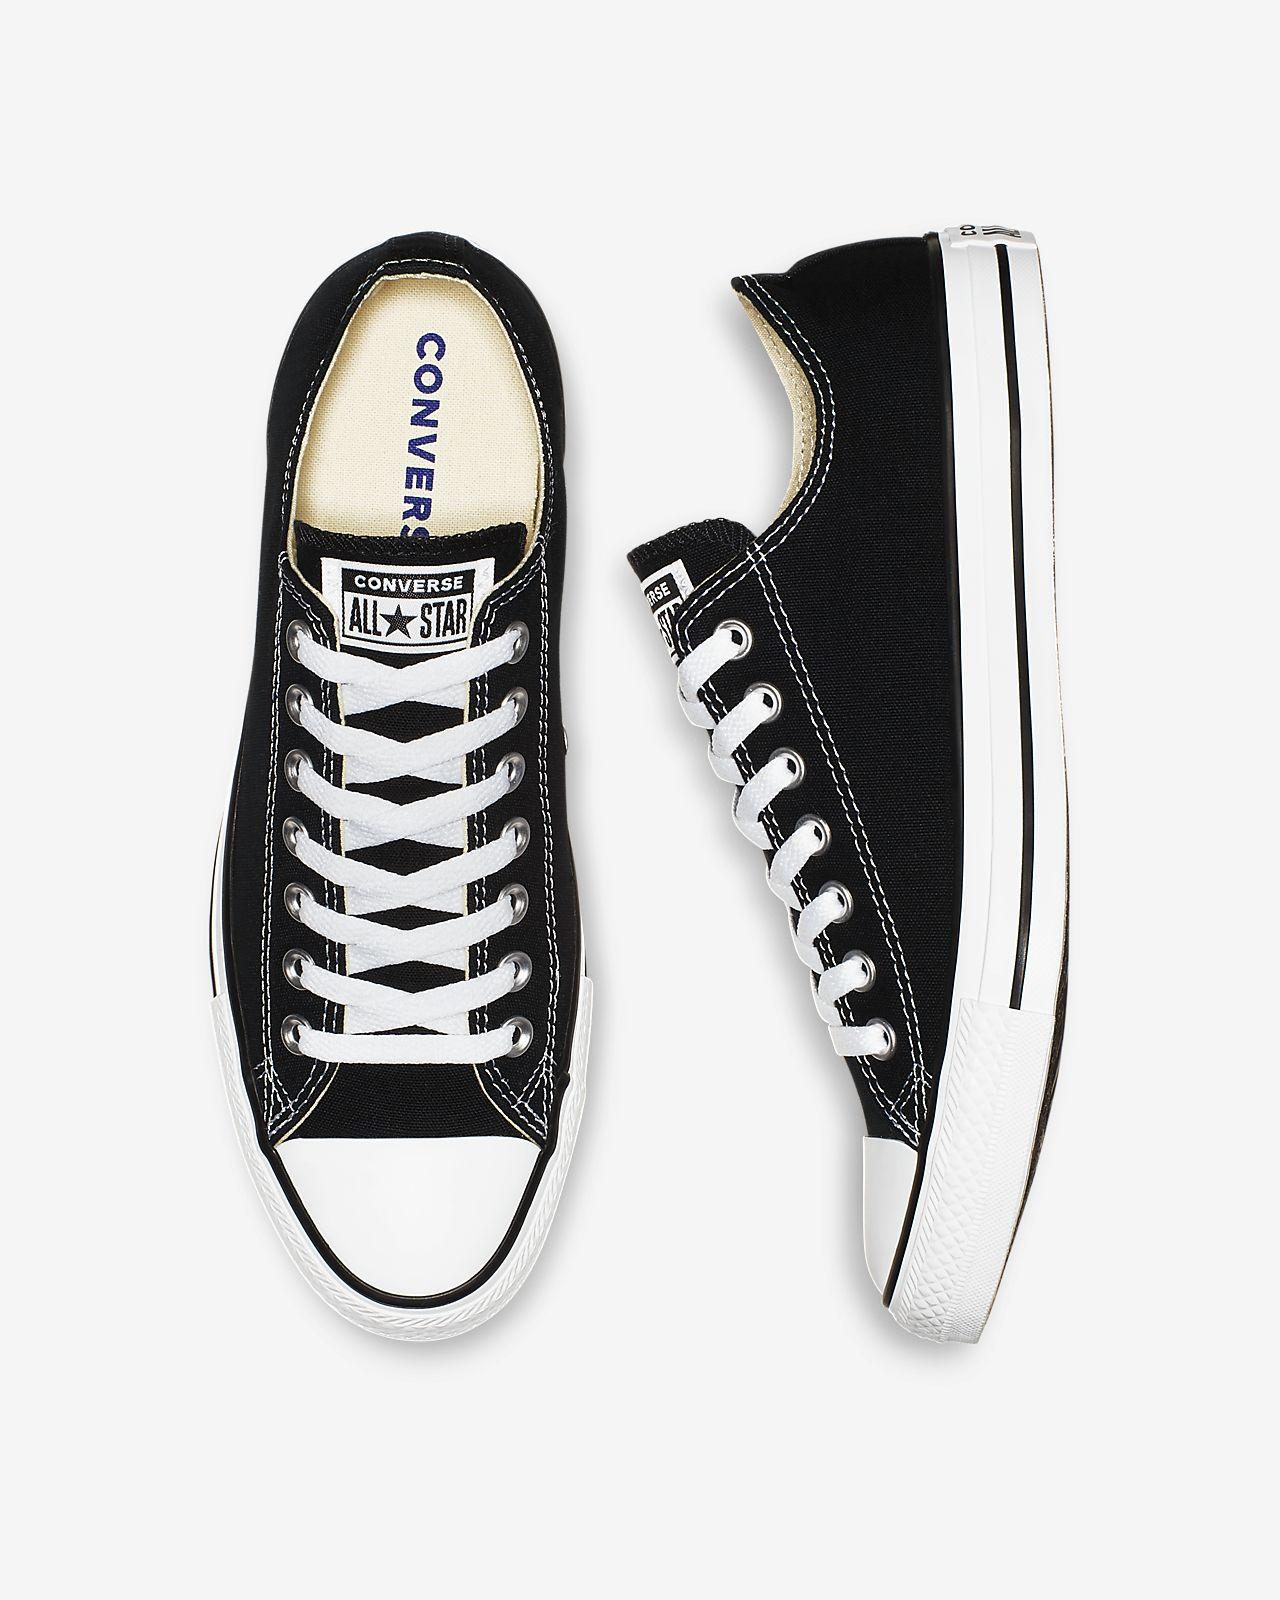 6f5901f64933 Converse Chuck Taylor All Star Low Top Unisex Shoe. Nike.com